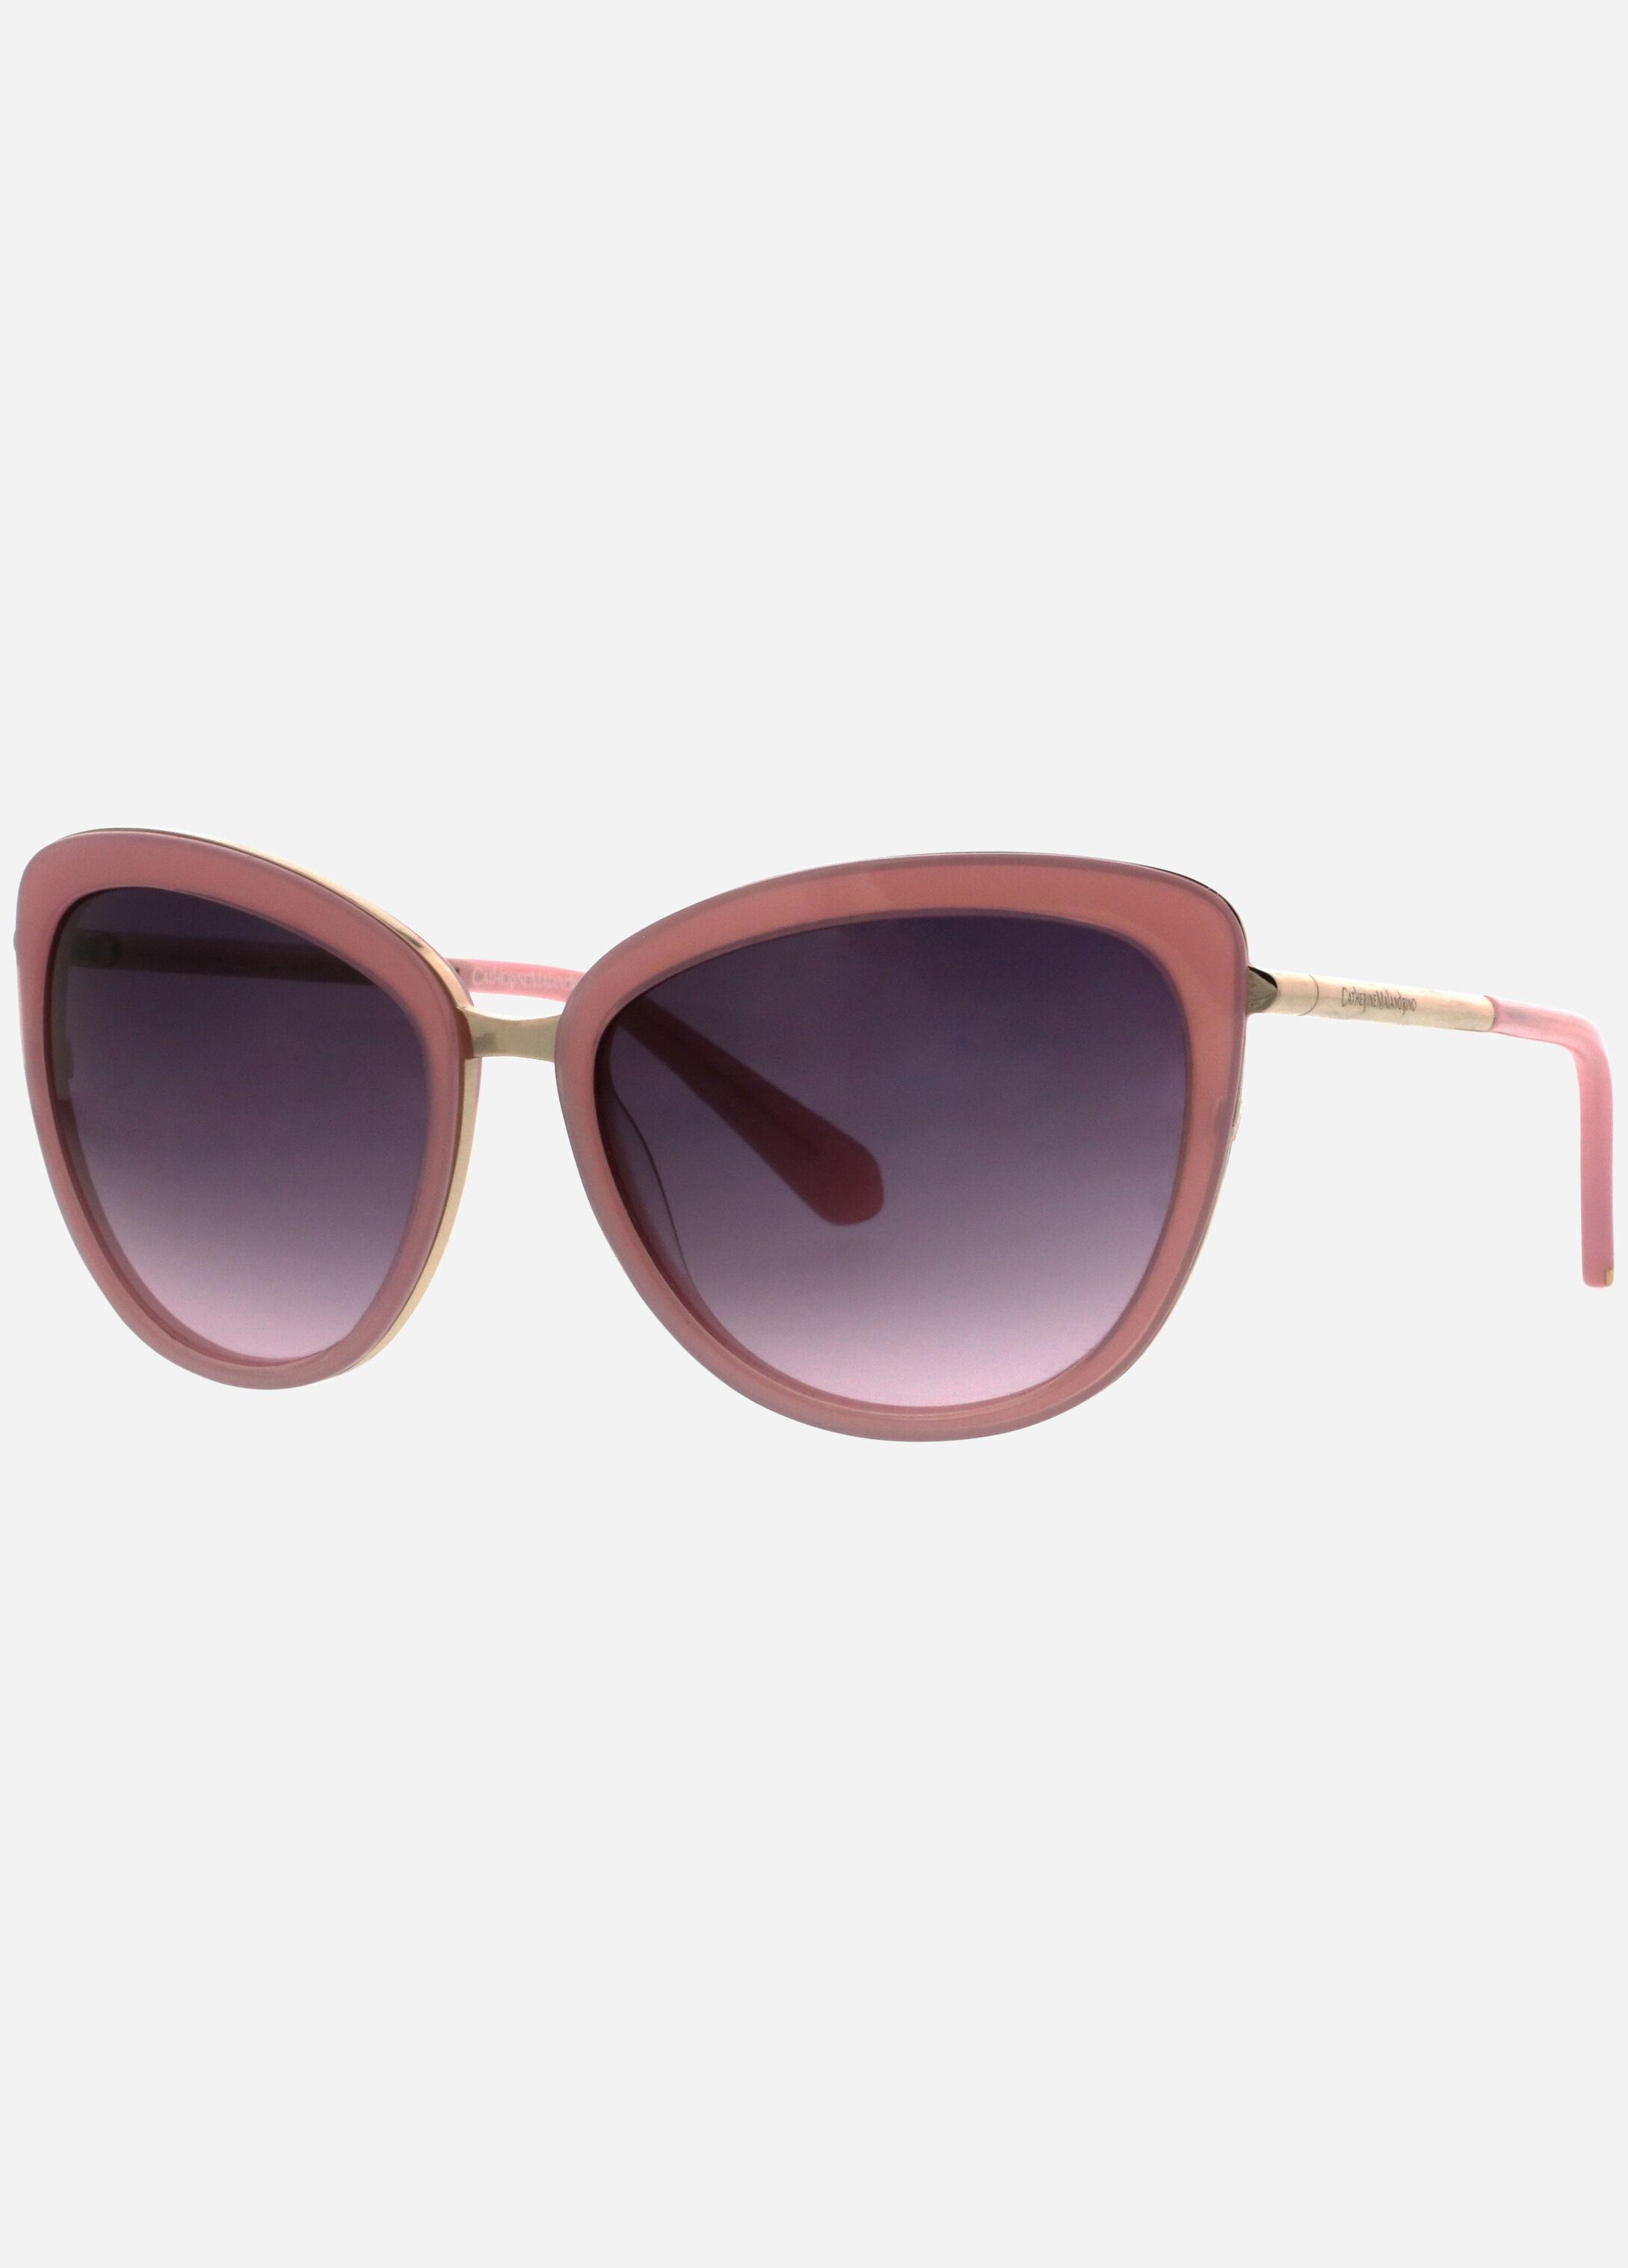 Catherine Malandrino Aviator Sunglasses